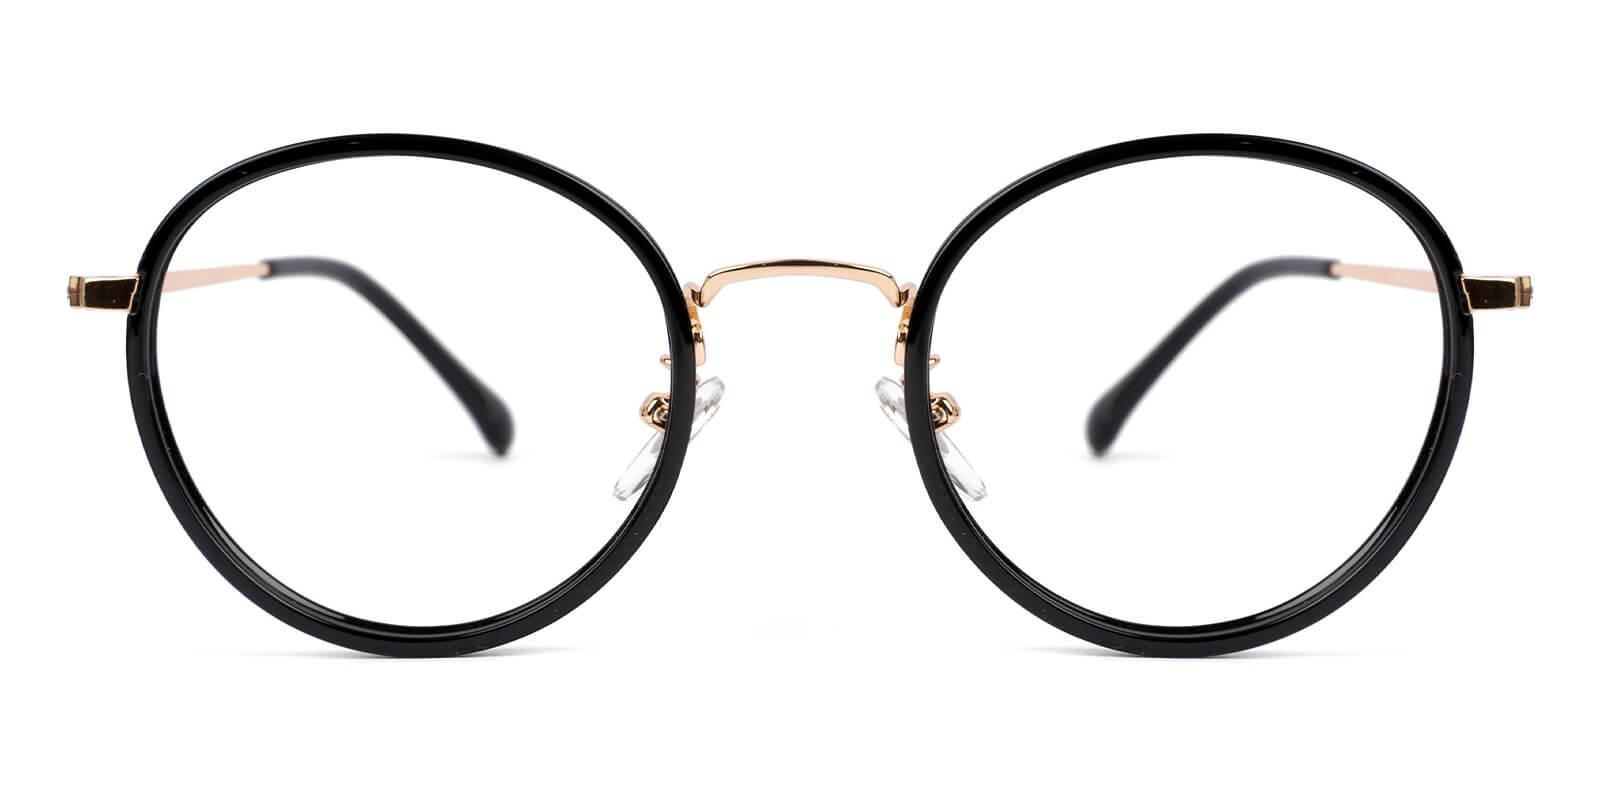 Modena Black Combination Eyeglasses , NosePads , SpringHinges Frames from ABBE Glasses